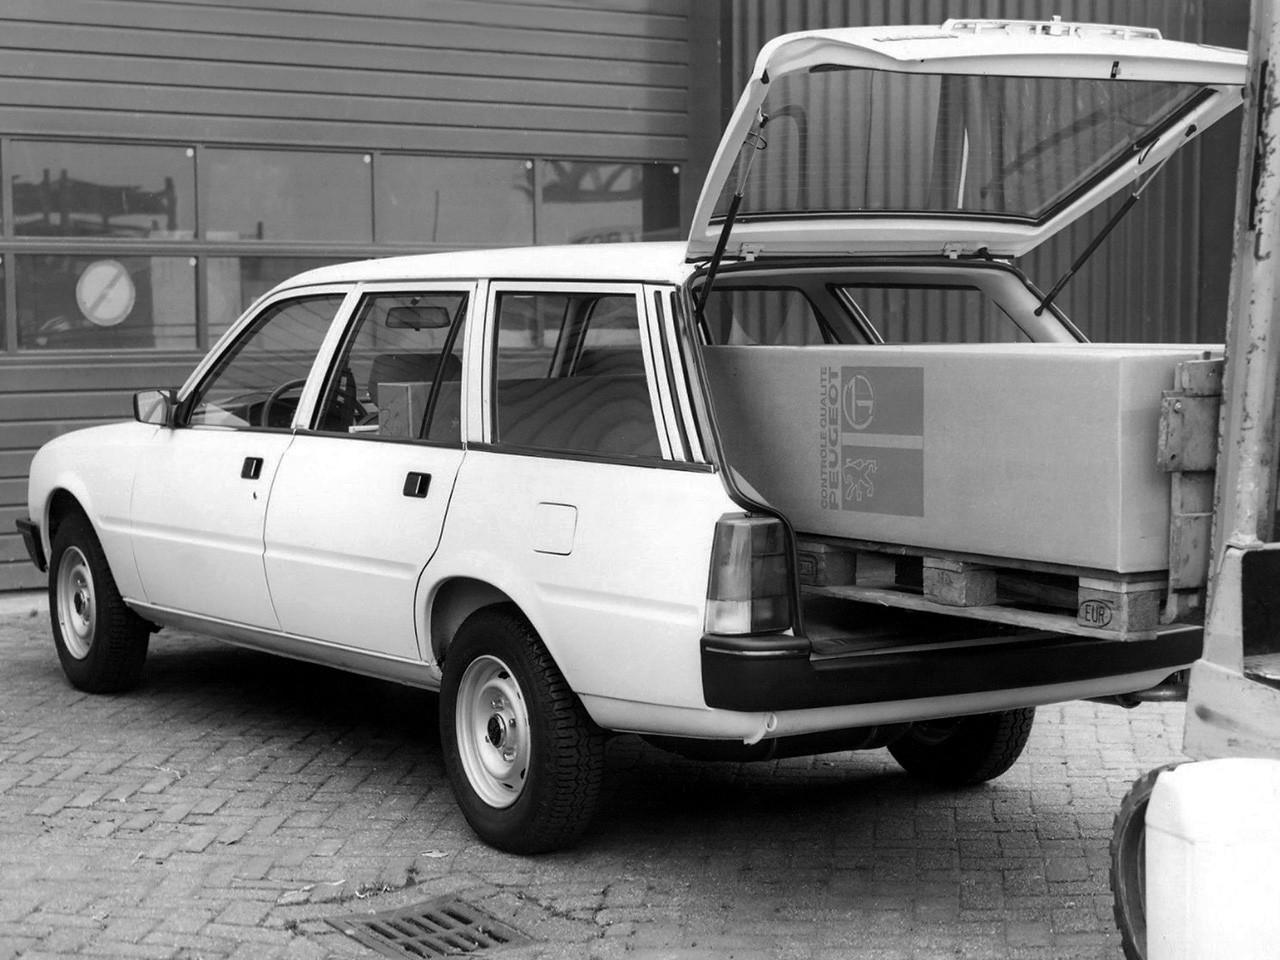 peugeot 505 break specs photos 1985 1986 1987 1988 1989 1990 1991 1992 autoevolution. Black Bedroom Furniture Sets. Home Design Ideas